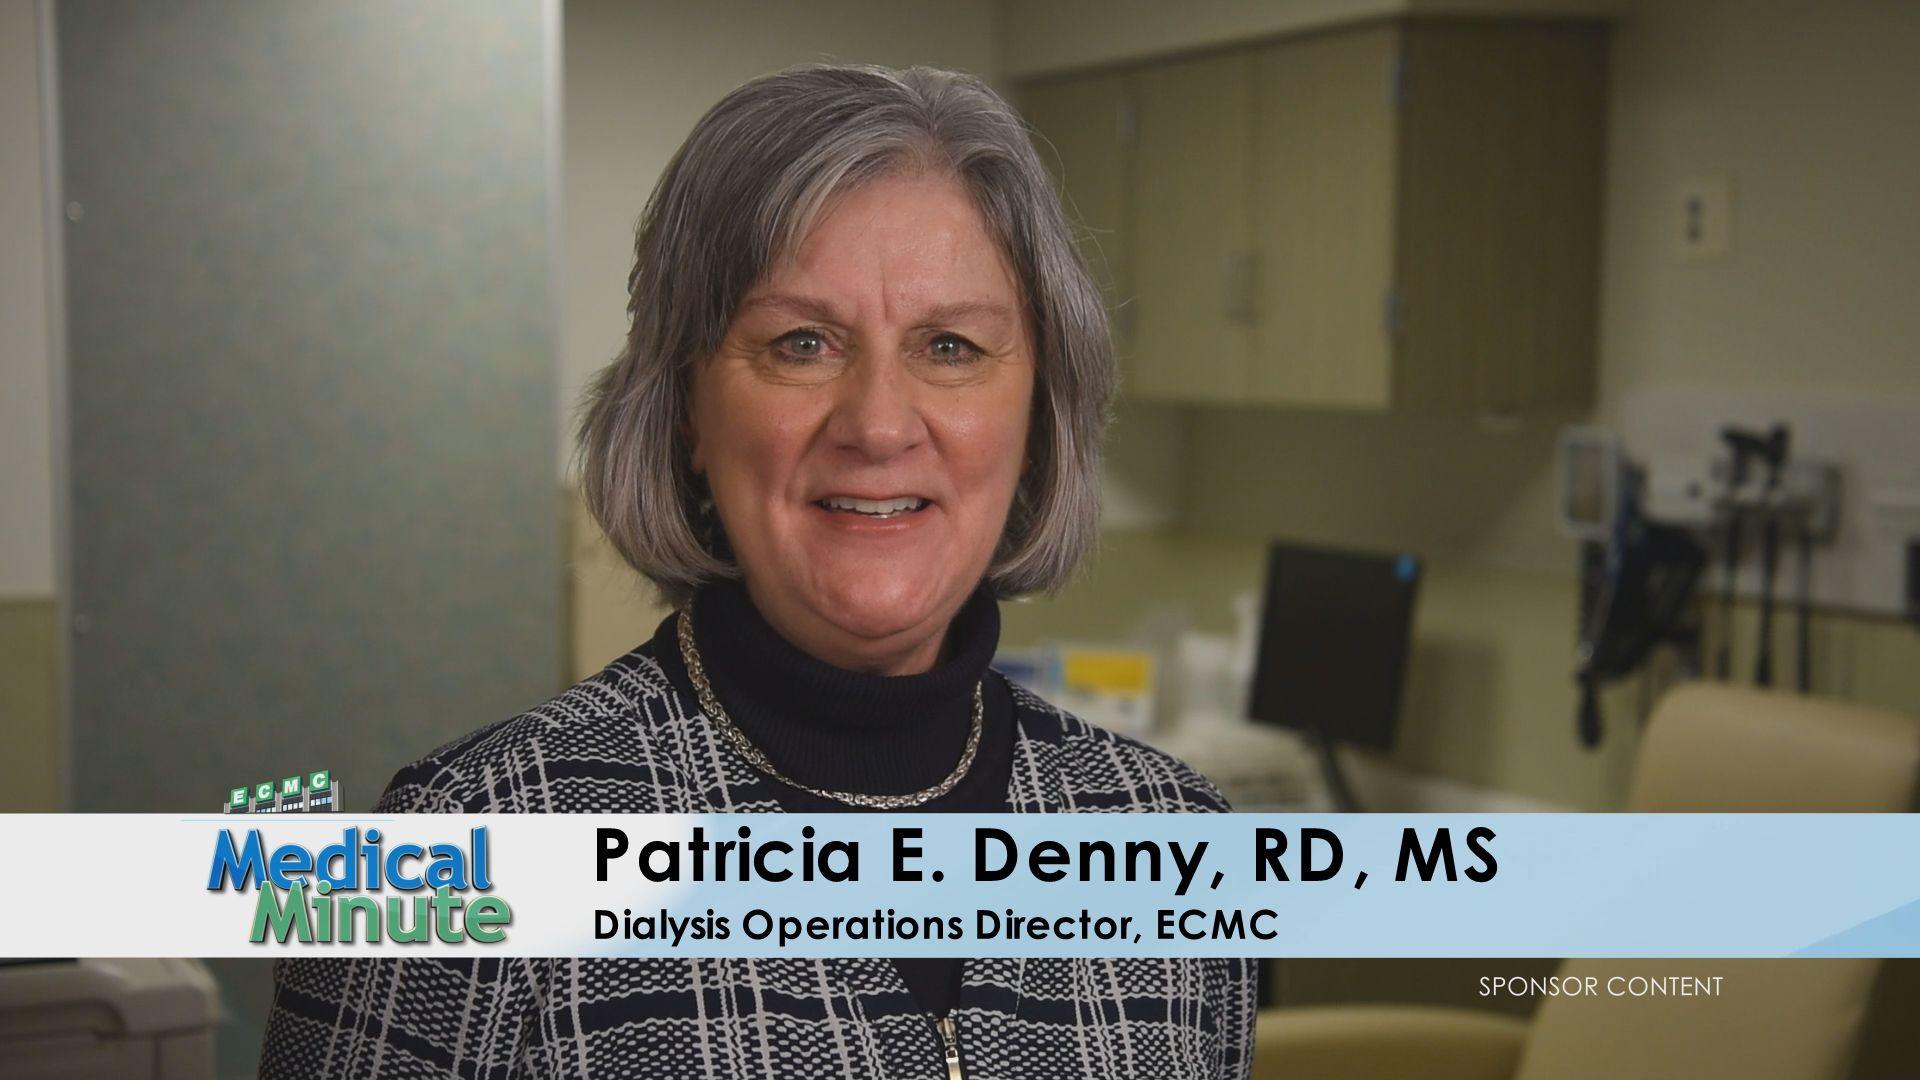 ECMCMedicalMinute PatriciaDenny,RD,MS KidneyDiseasePatientEducationSessions 112519 STILL